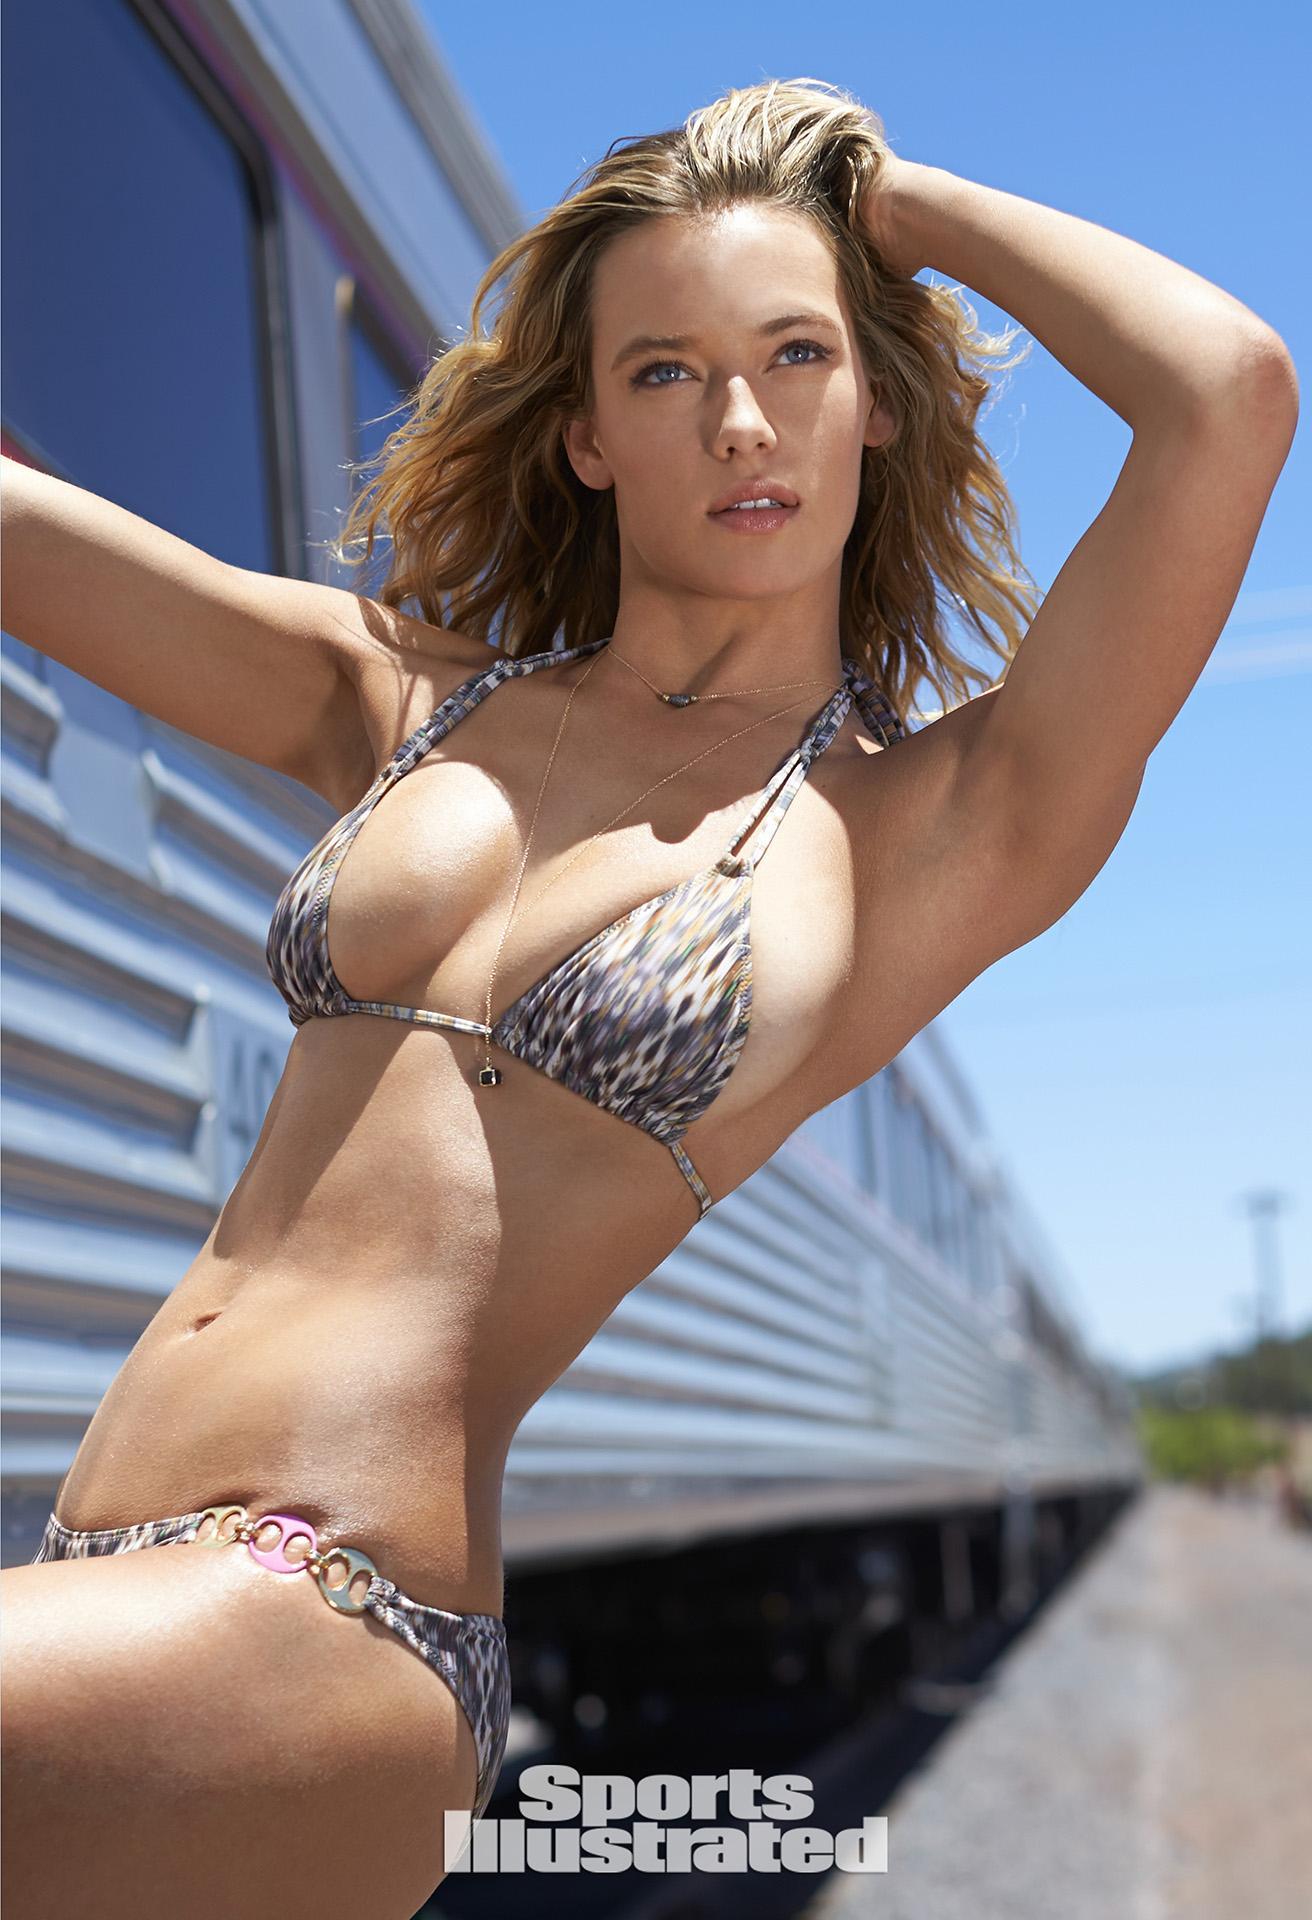 Hannah Ferguson Swimsuit Photos, Sports Illustrated